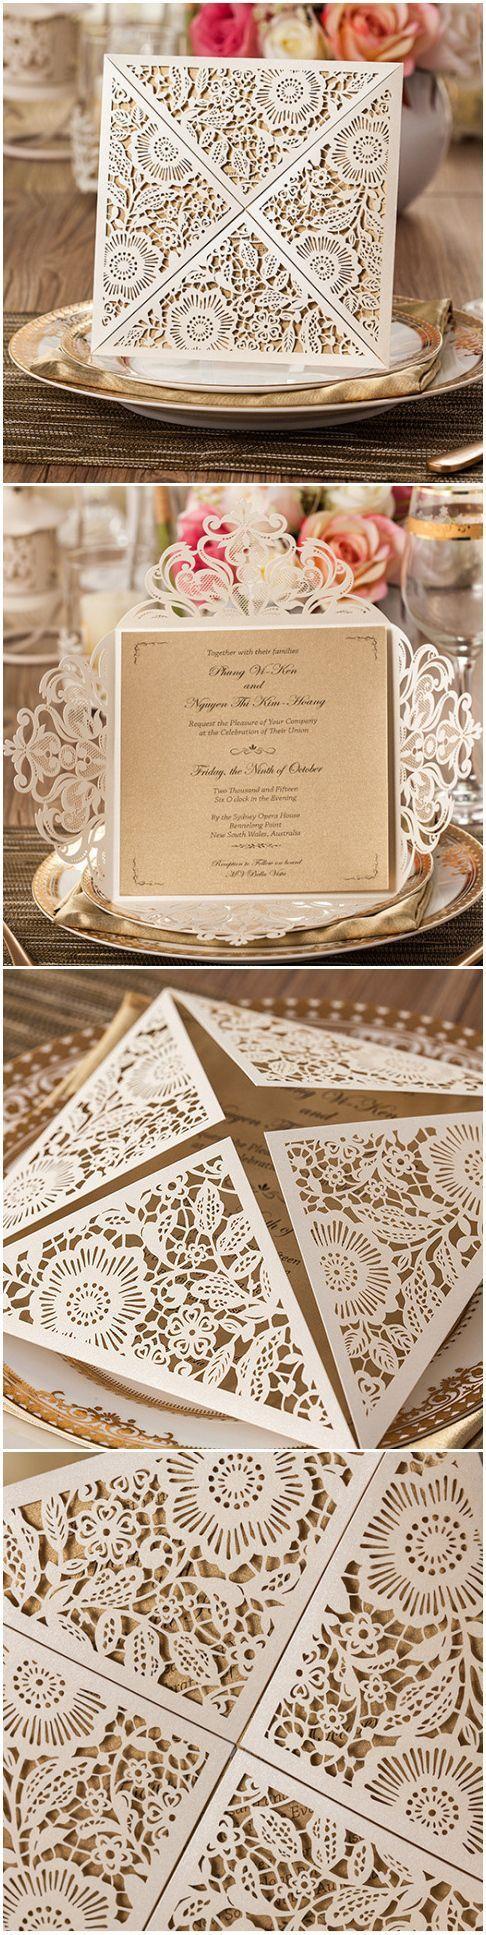 delicate metallic laser cut wedding invitations